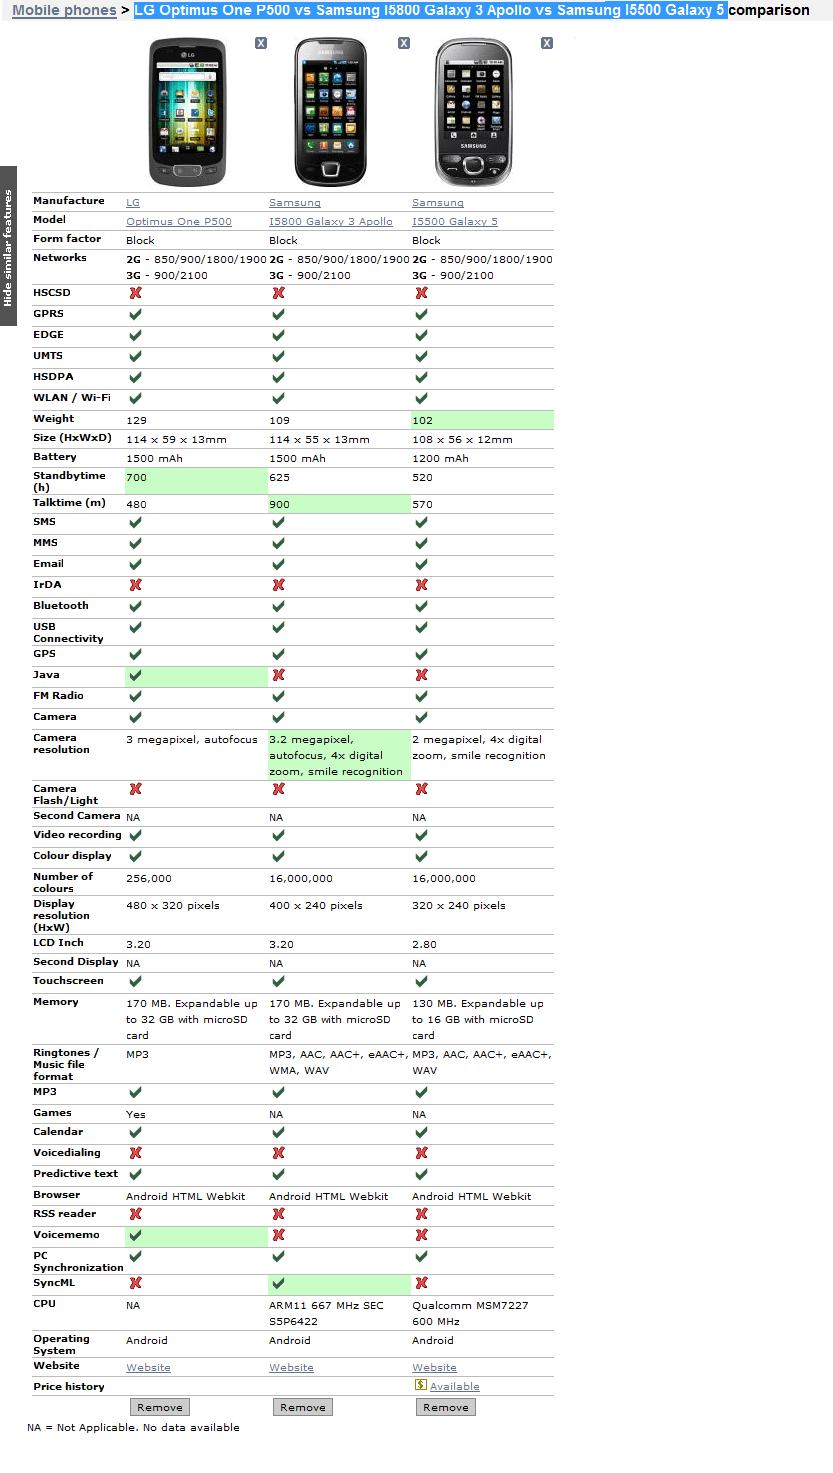 LG Optimus One vs Samsung Galaxy 3 vs Samsung Galaxy 5